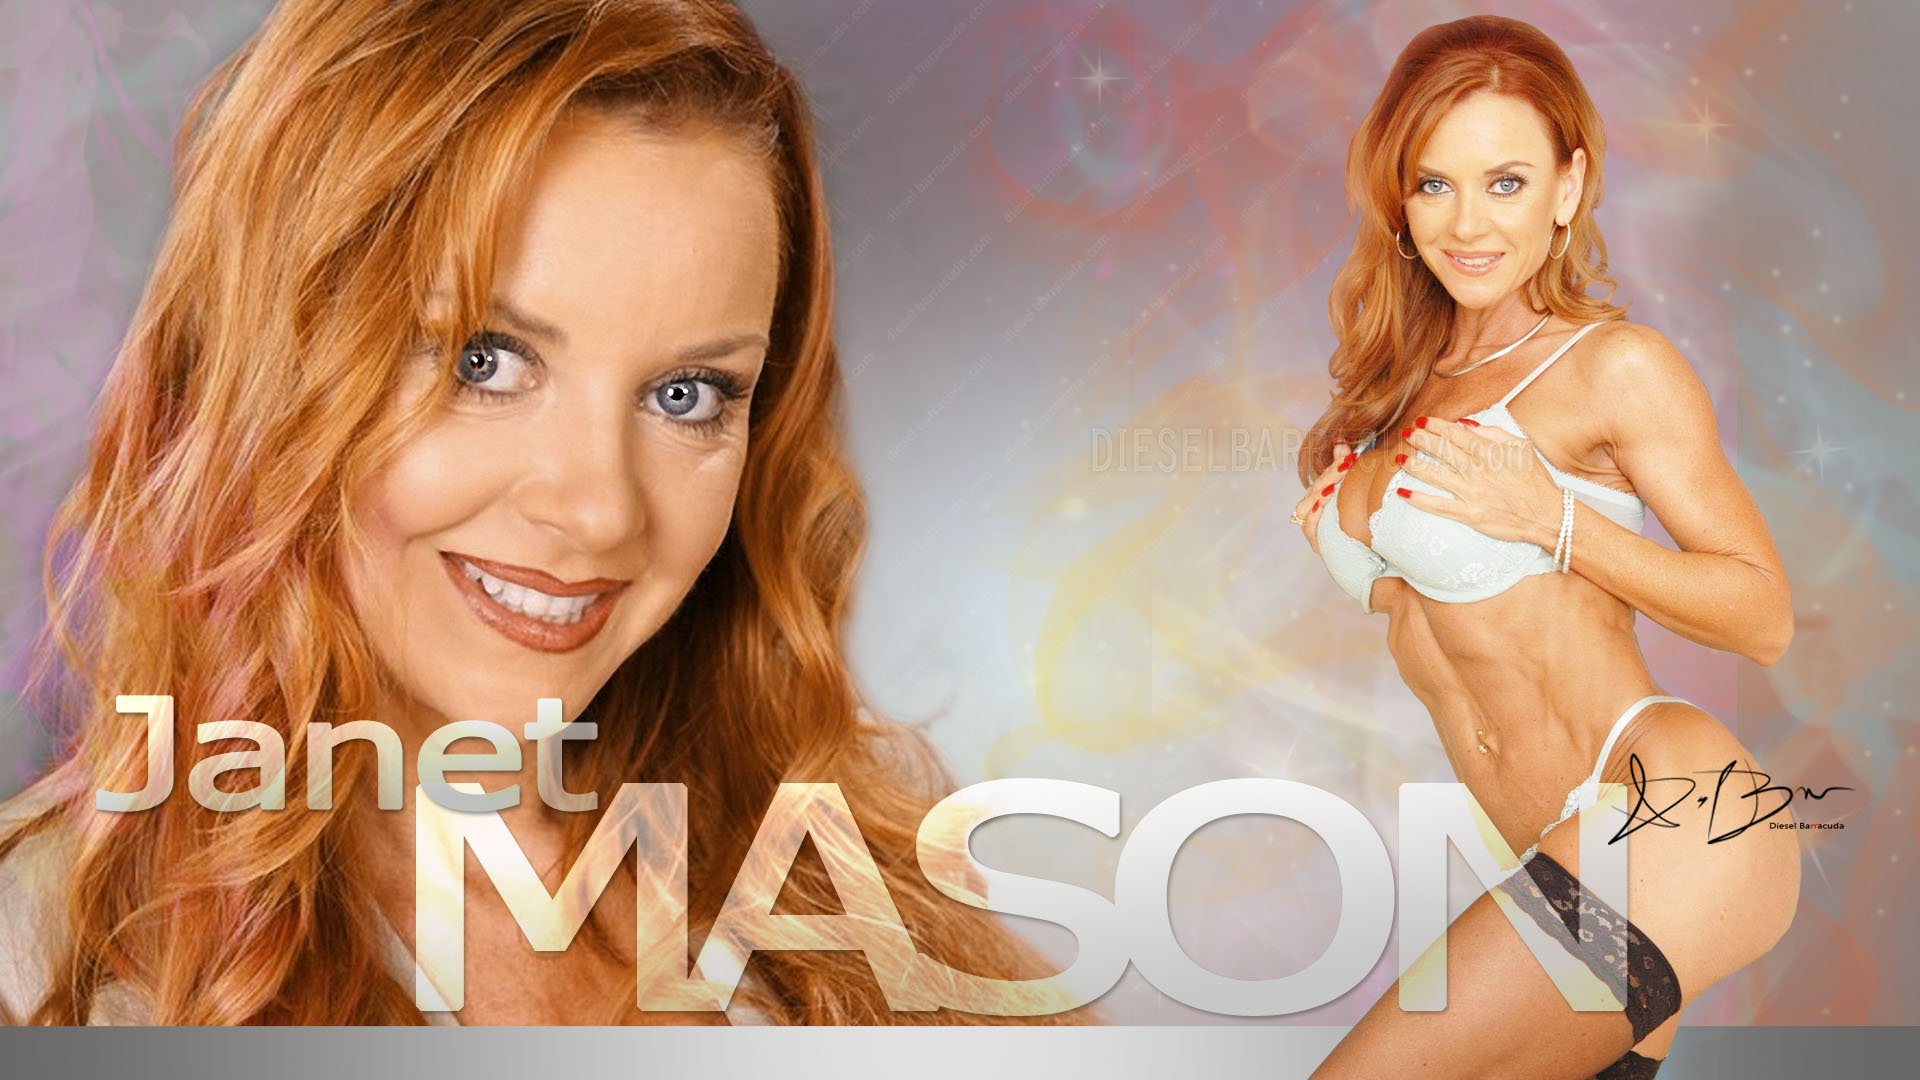 Hd Milf Photos Milf Sexy Cougar Mason Wallpaper Data Diesel Janet ...